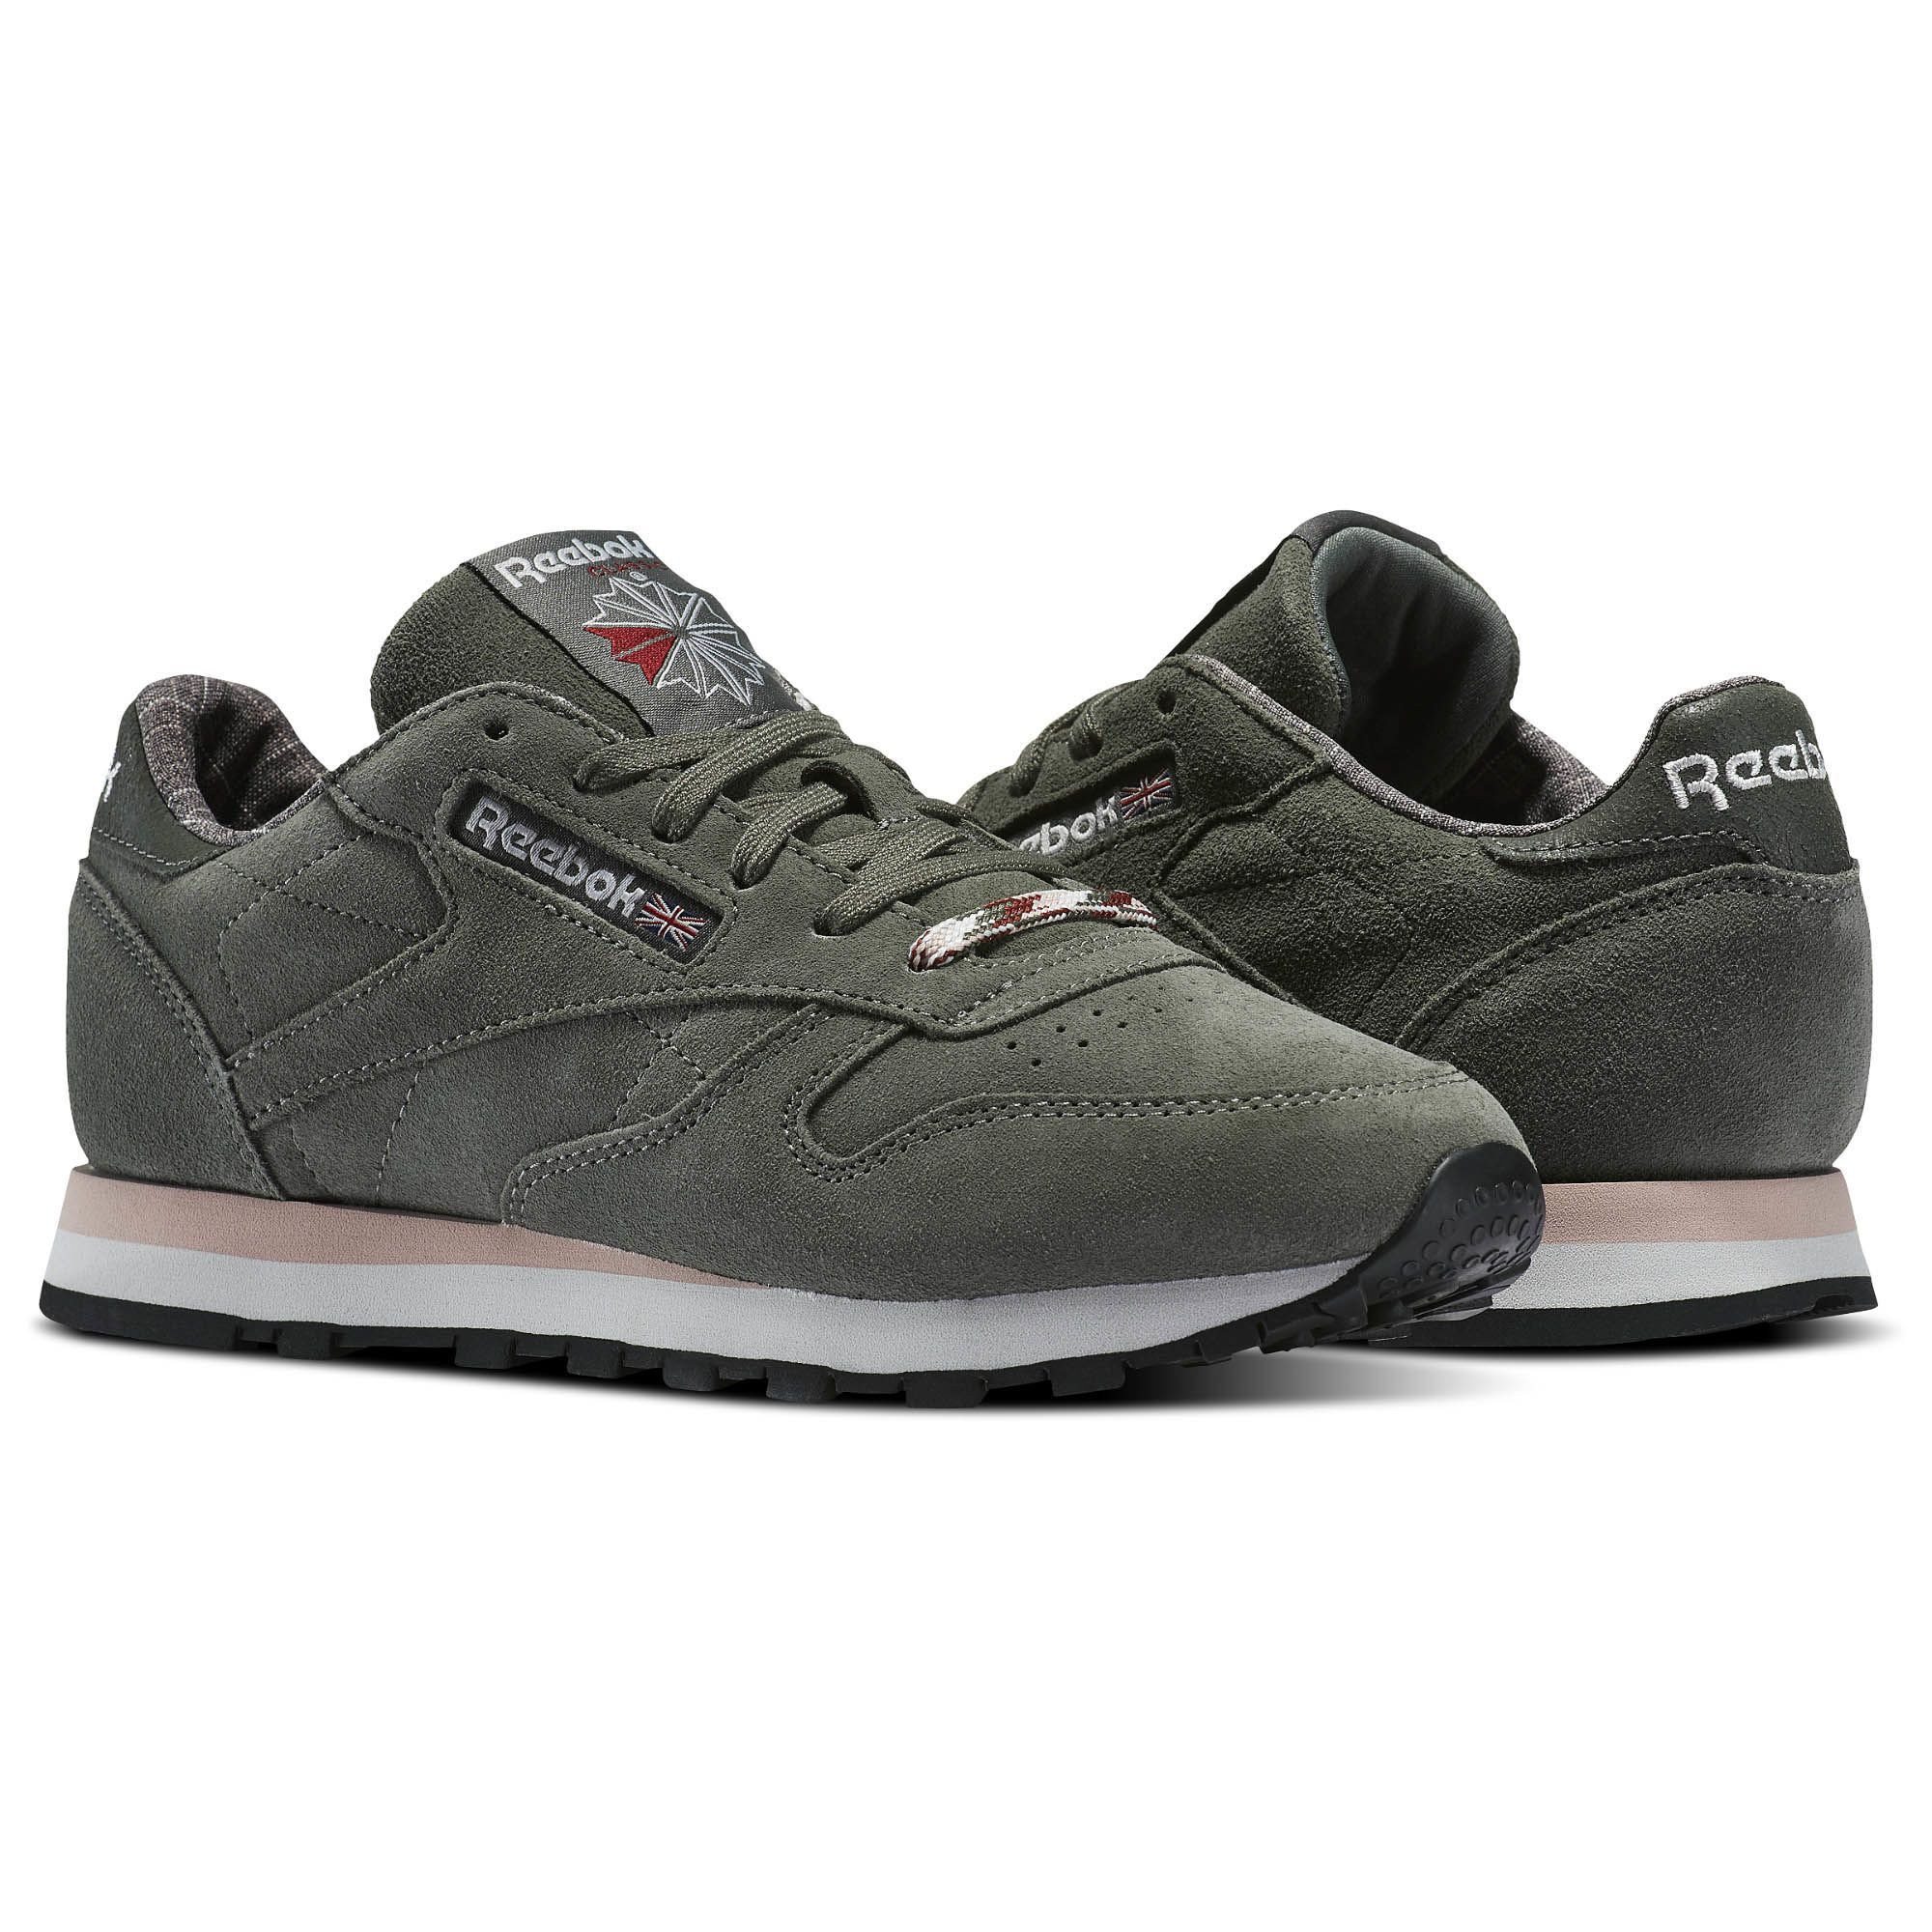 timeless design 339a3 4ae2e Reebok - Classic Leather W W Reebok Clasicas, Zapatillas De Cuero, Zapatos,  Tienda Oficial